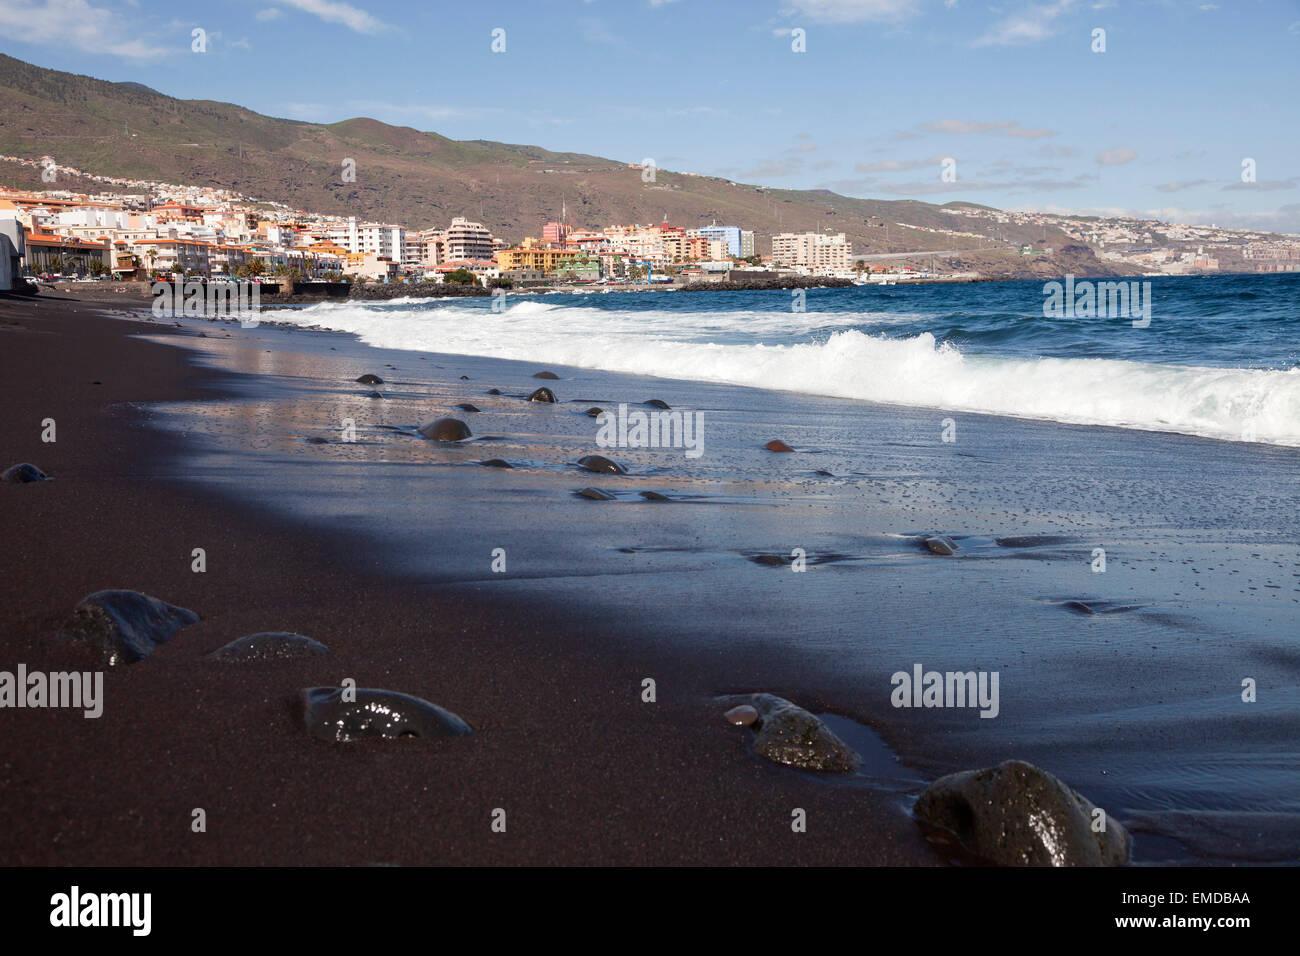 the black sandy beach in Candelaria, Tenerife, Canary Islands, Spain, Europe - Stock Image